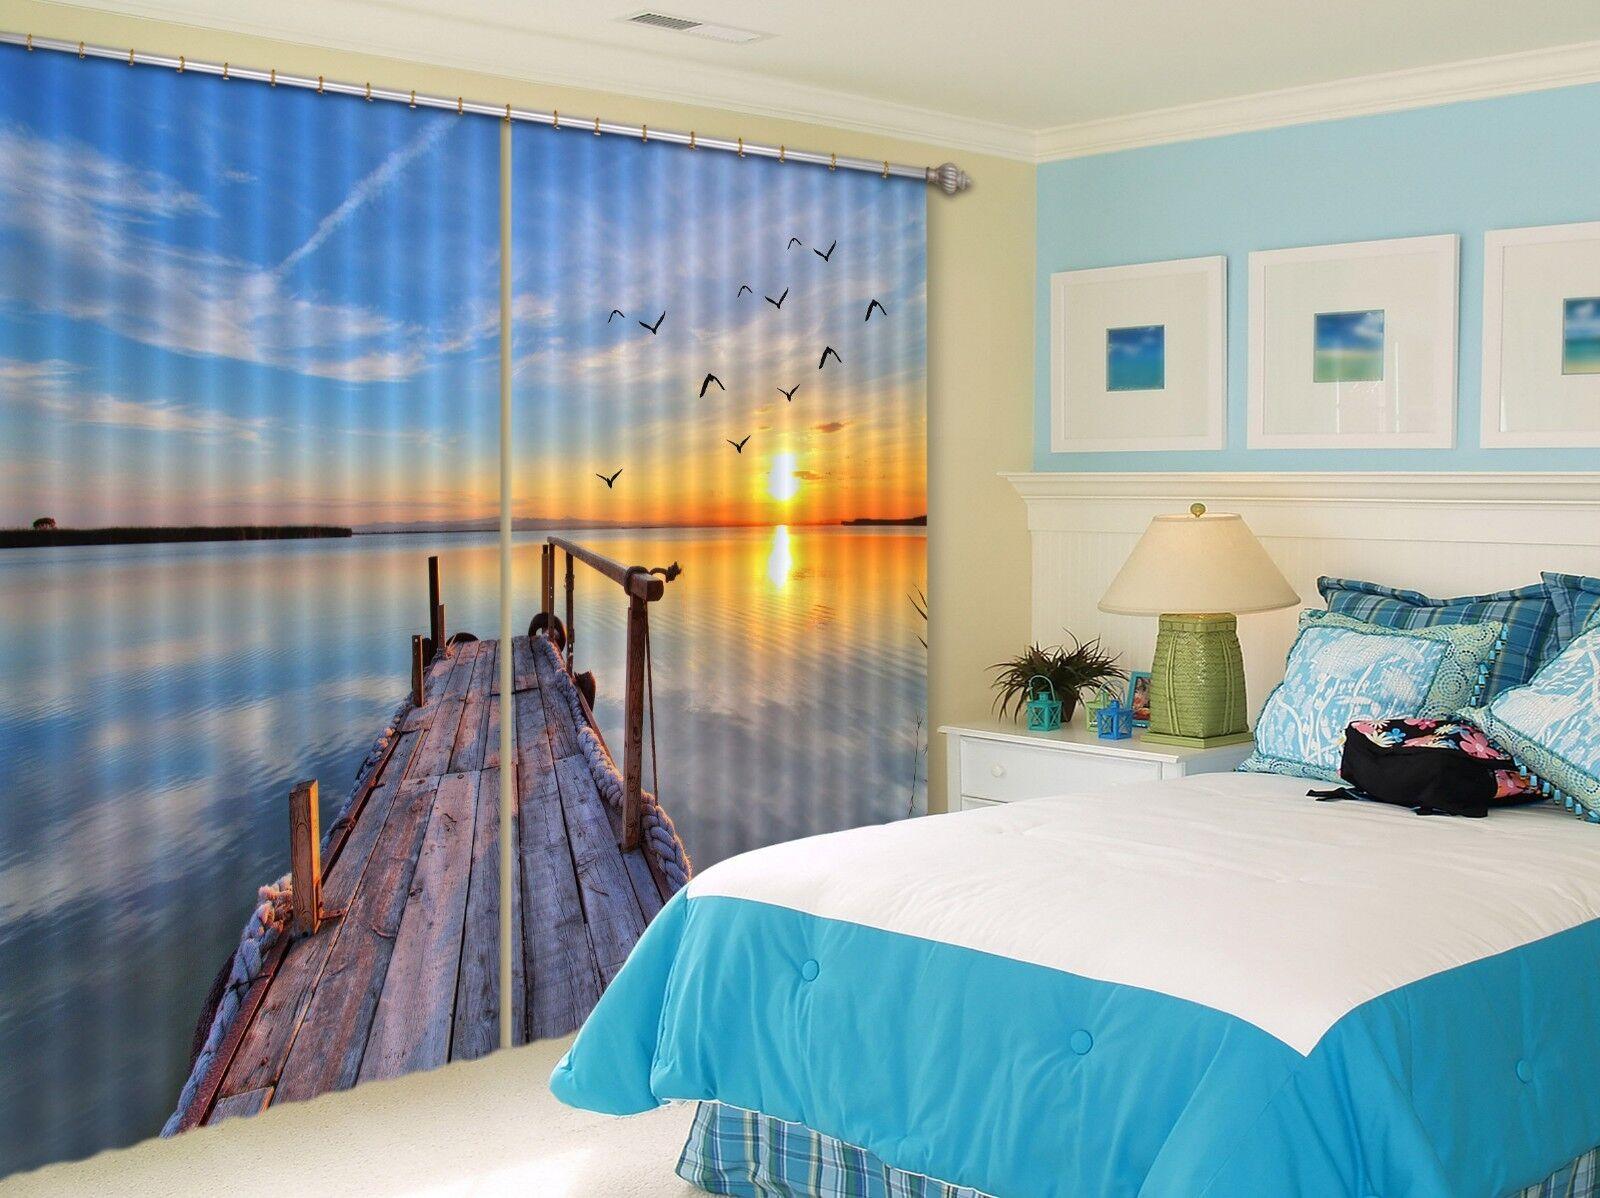 3D Sol aves 36 Cortinas de impresión de cortina de foto Blockout Tela Cortinas Ventana au